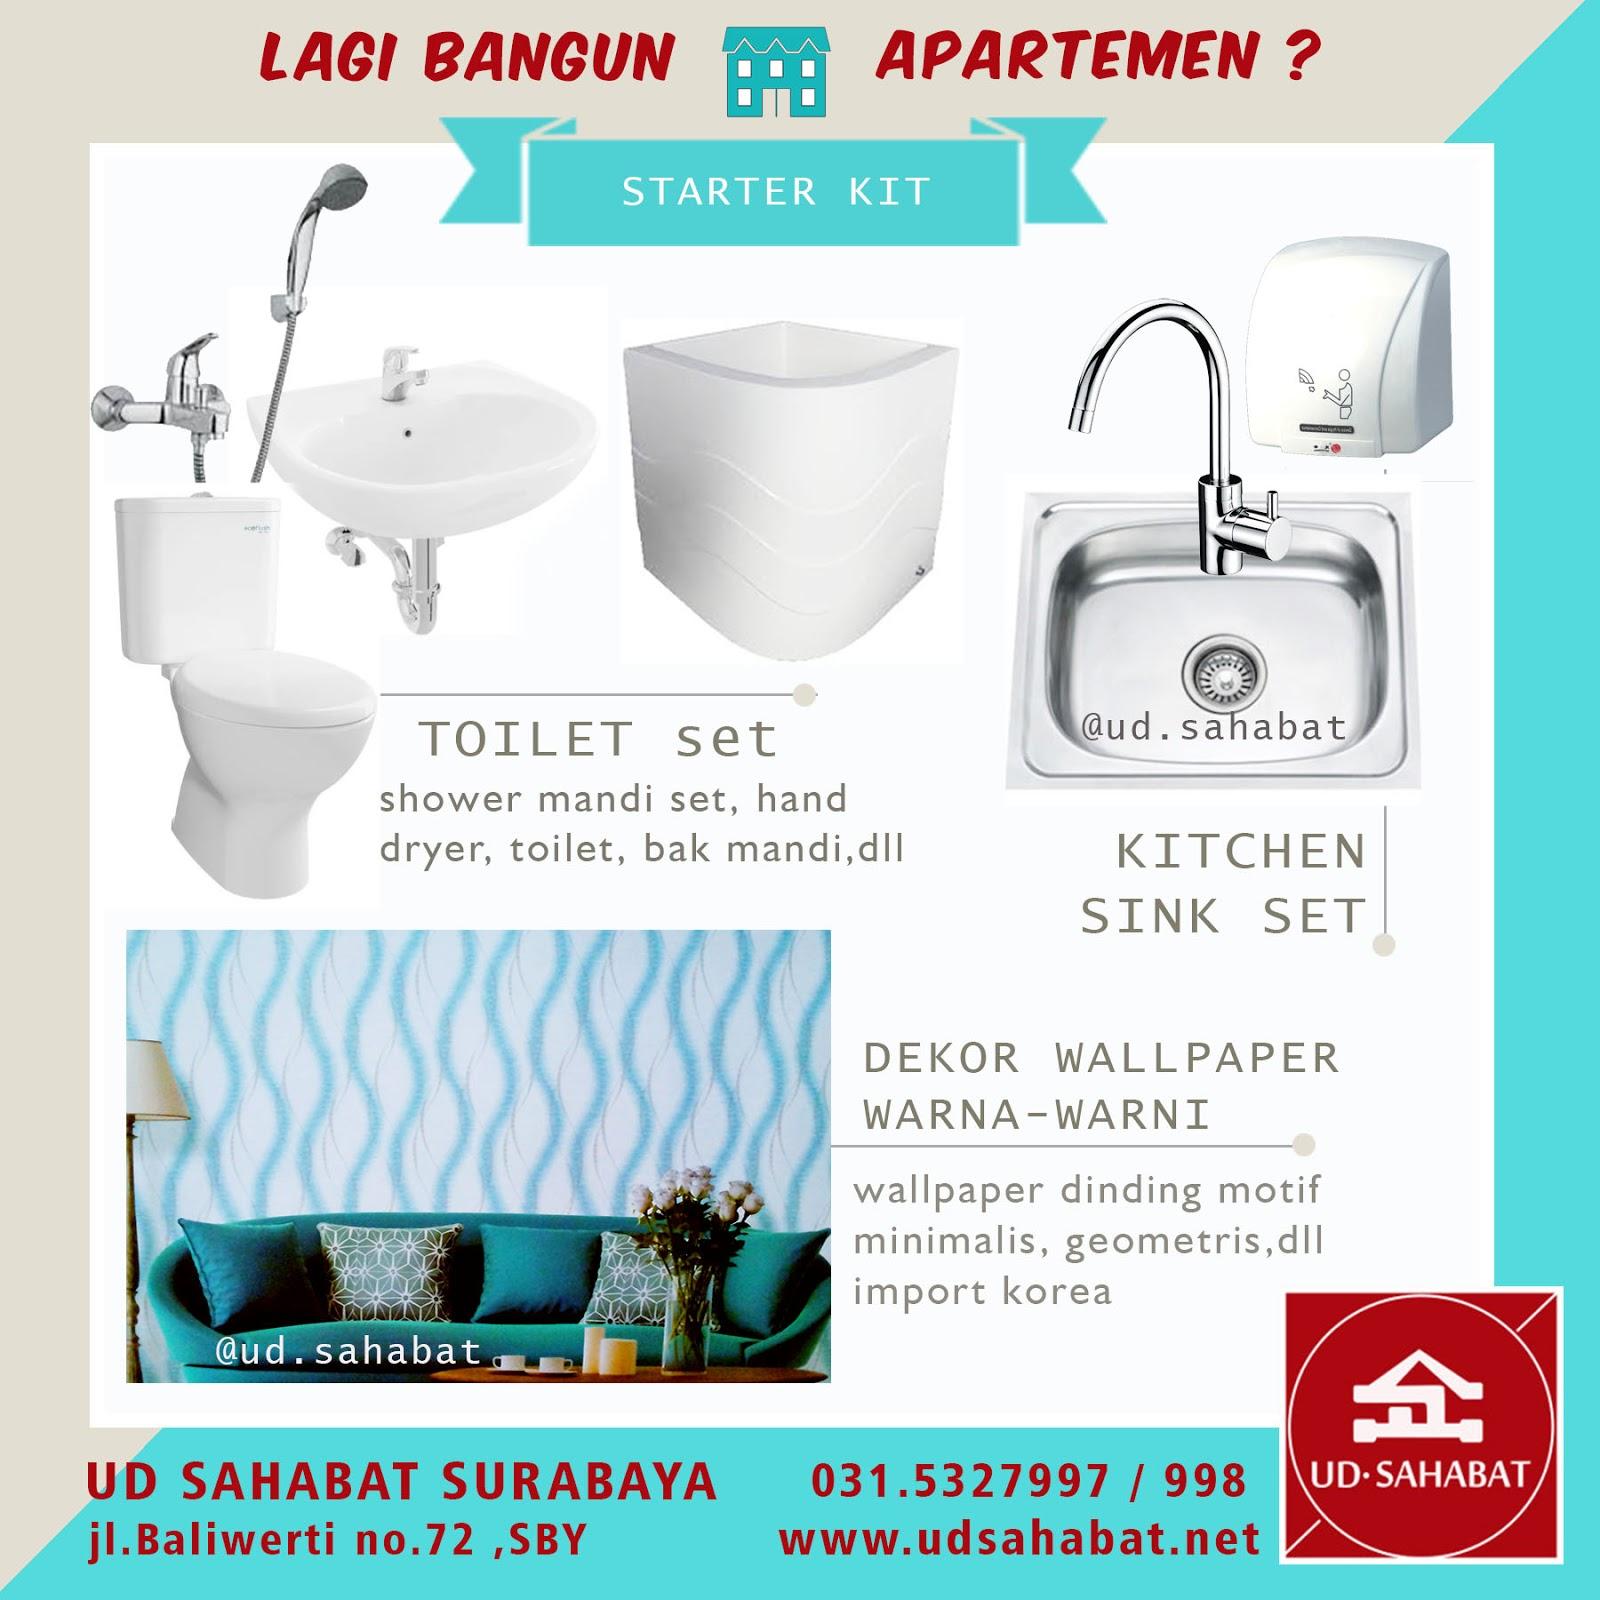 jual sanitary wastafel kloset kamar mandi ud sahabat surabaya